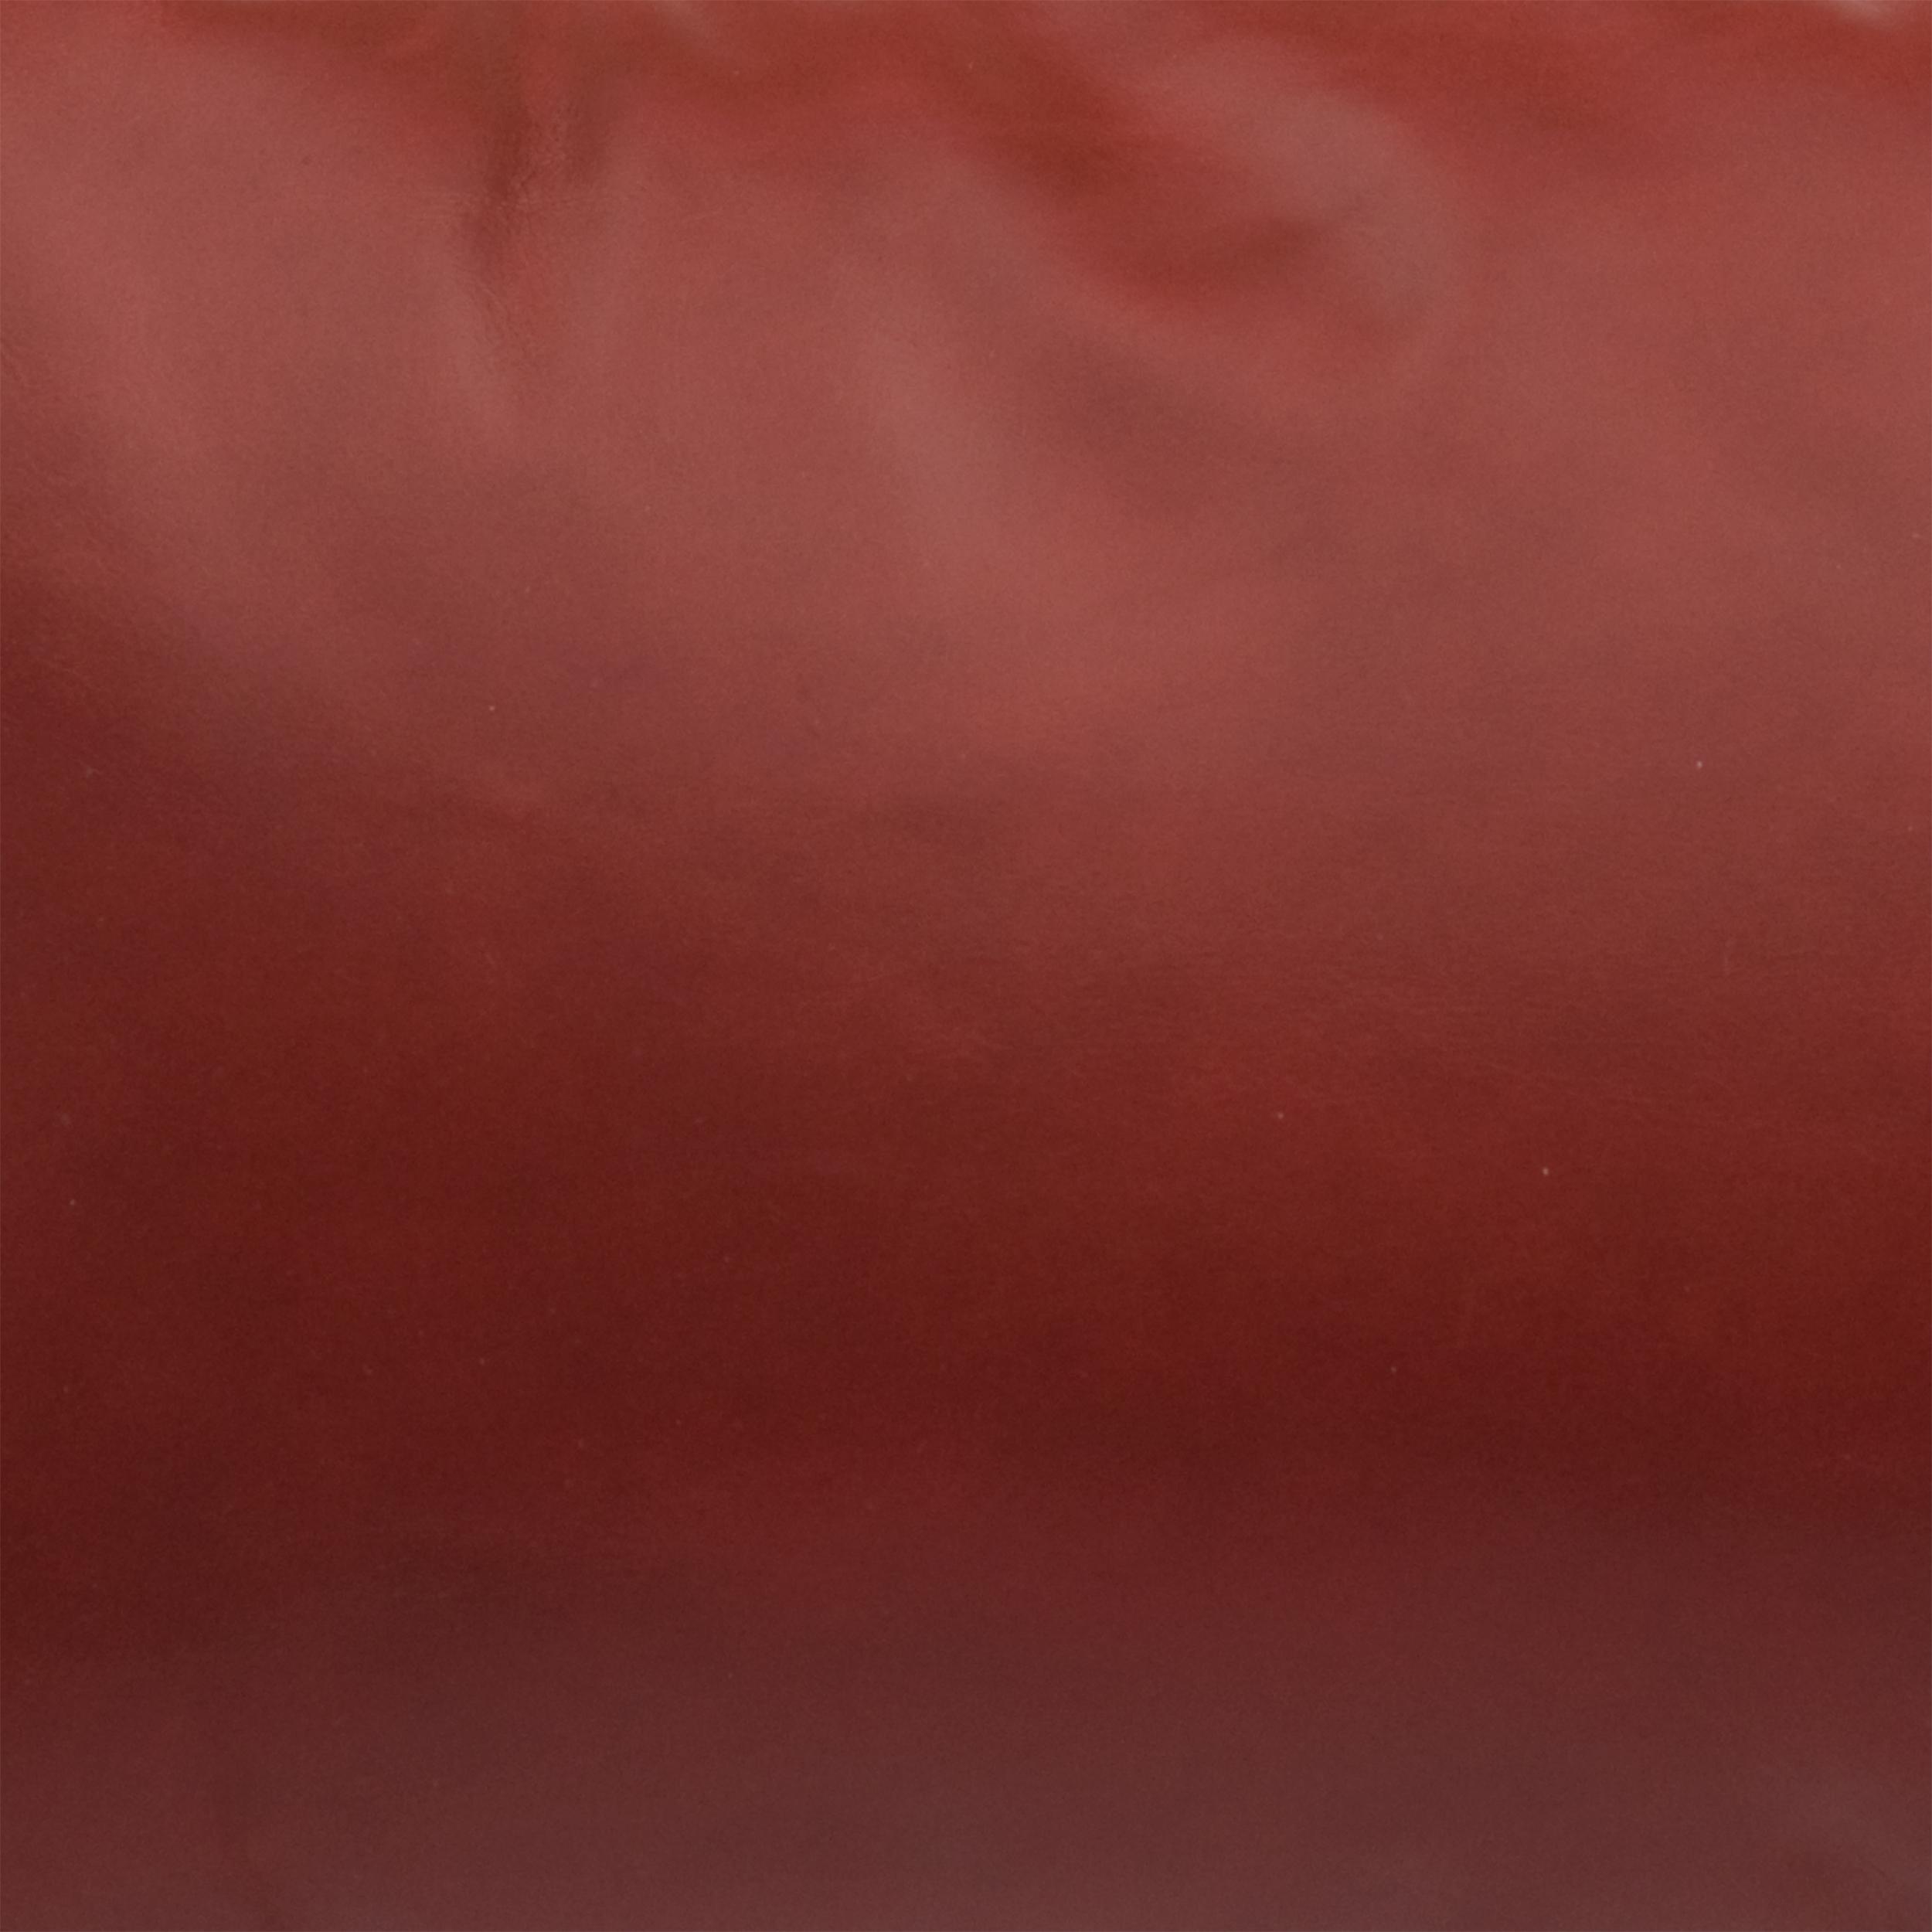 Dark Red Leather